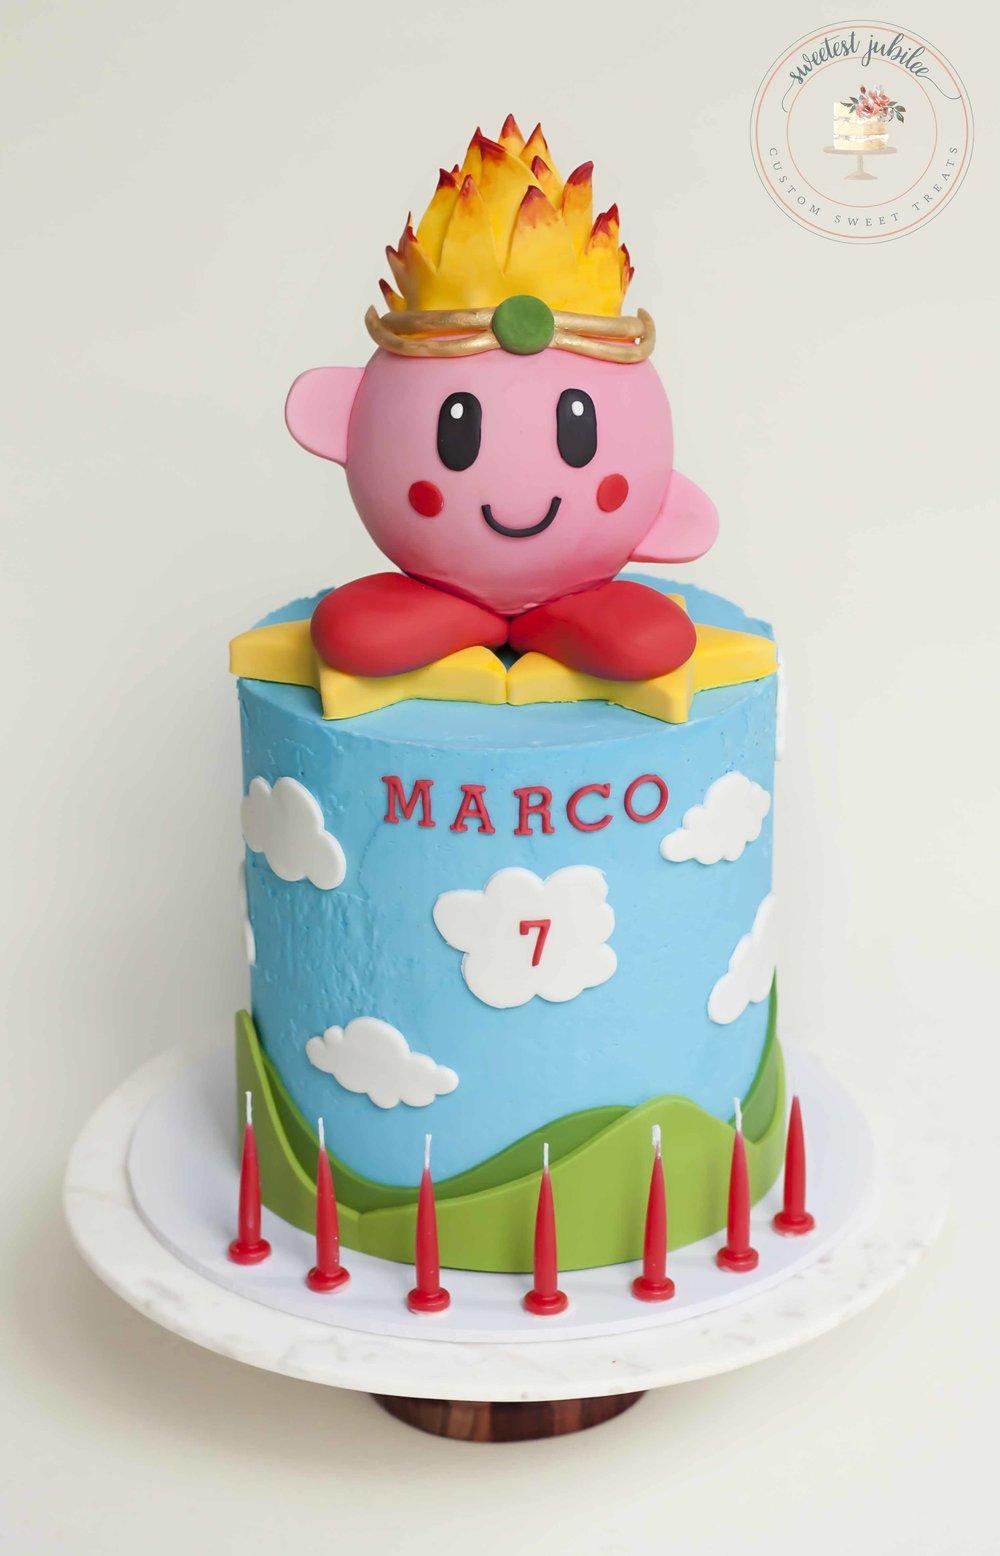 Marco 7th cake.jpg